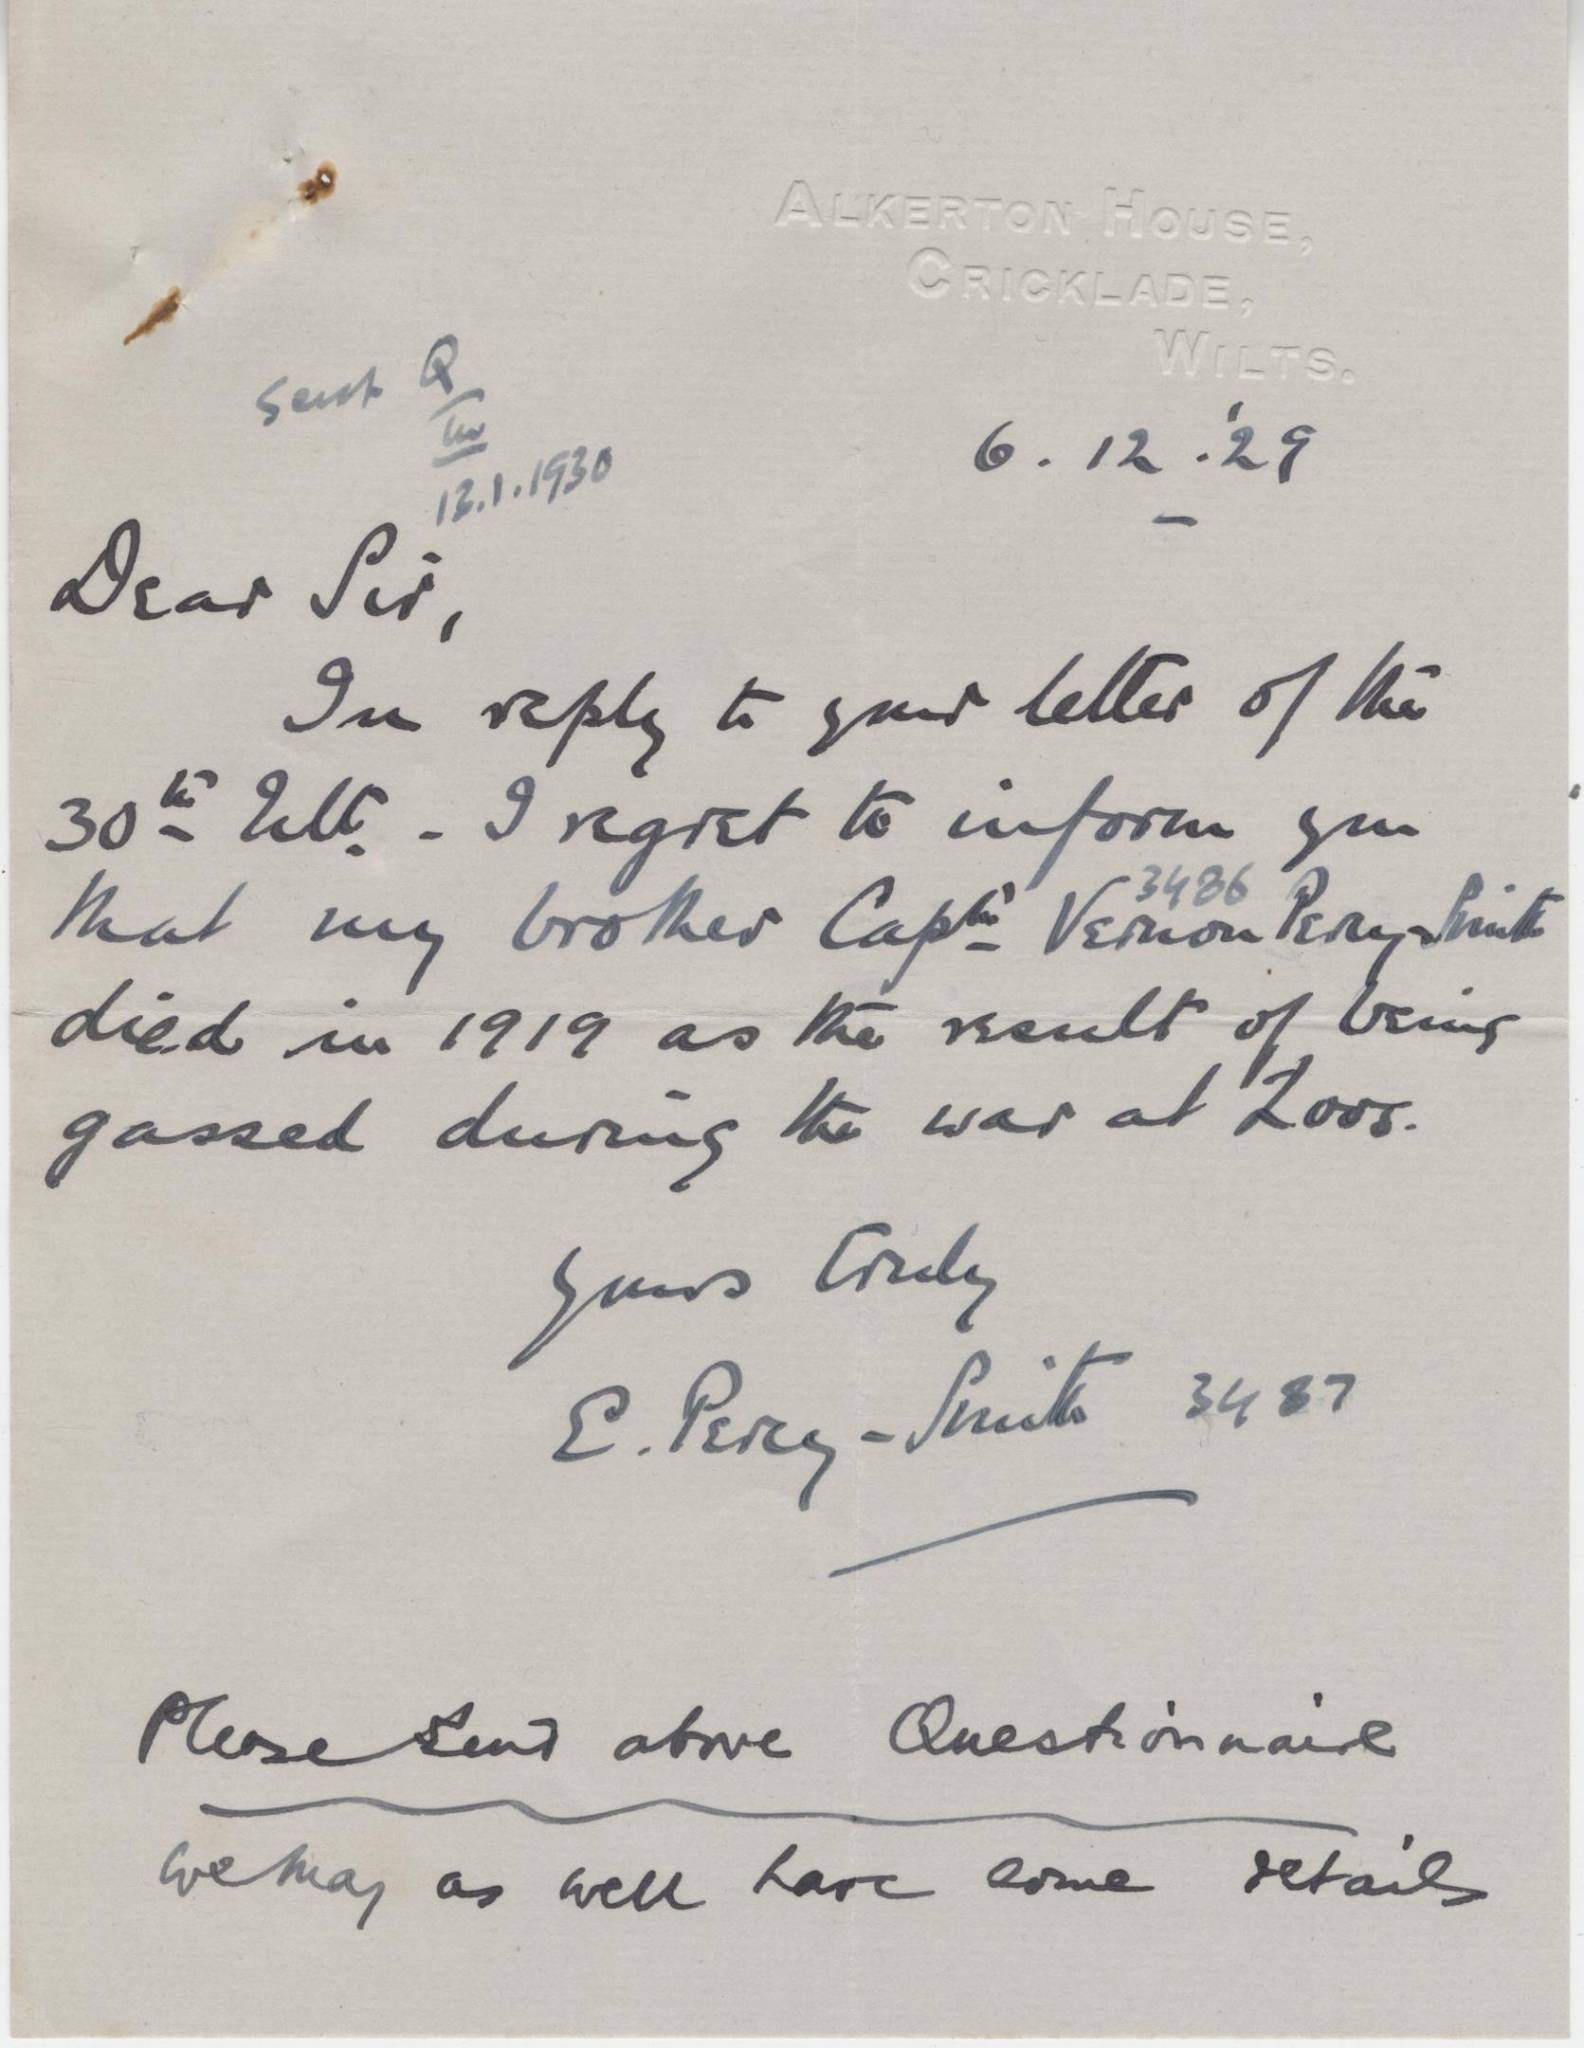 Percy Smith V Letter